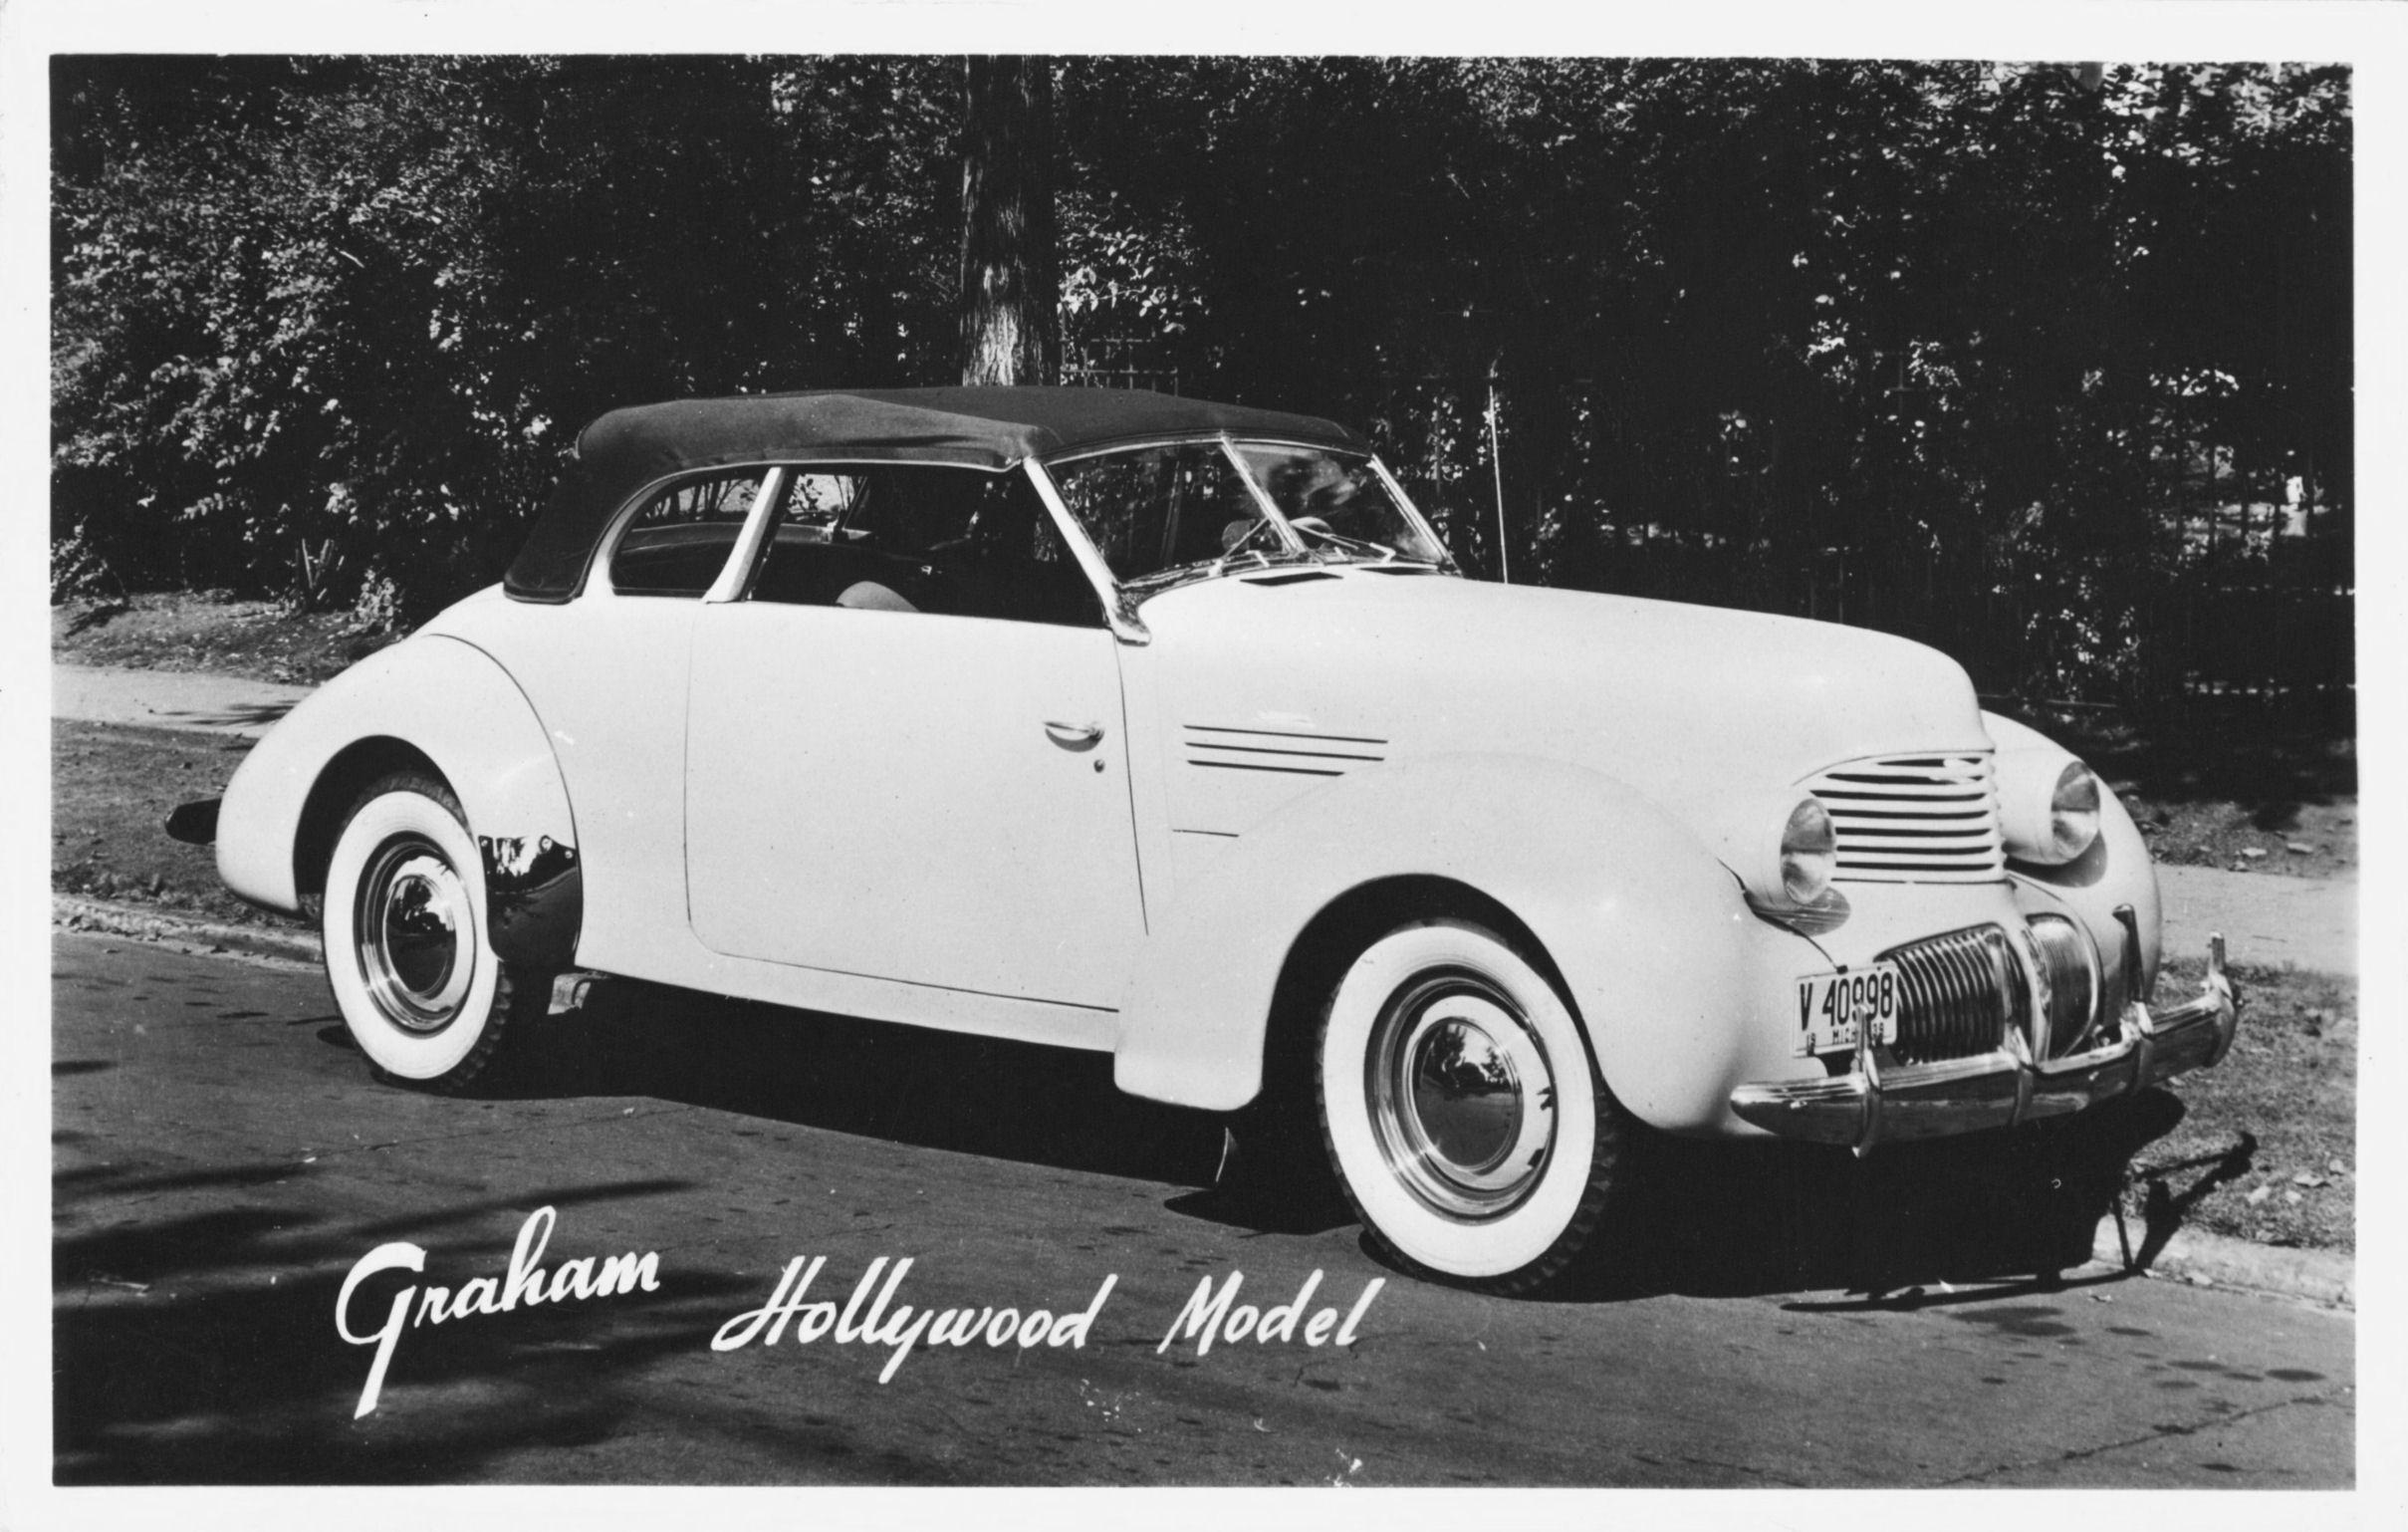 1940 Graham Hollywood Convertible | Cars, Vintage trucks, Vintage cars